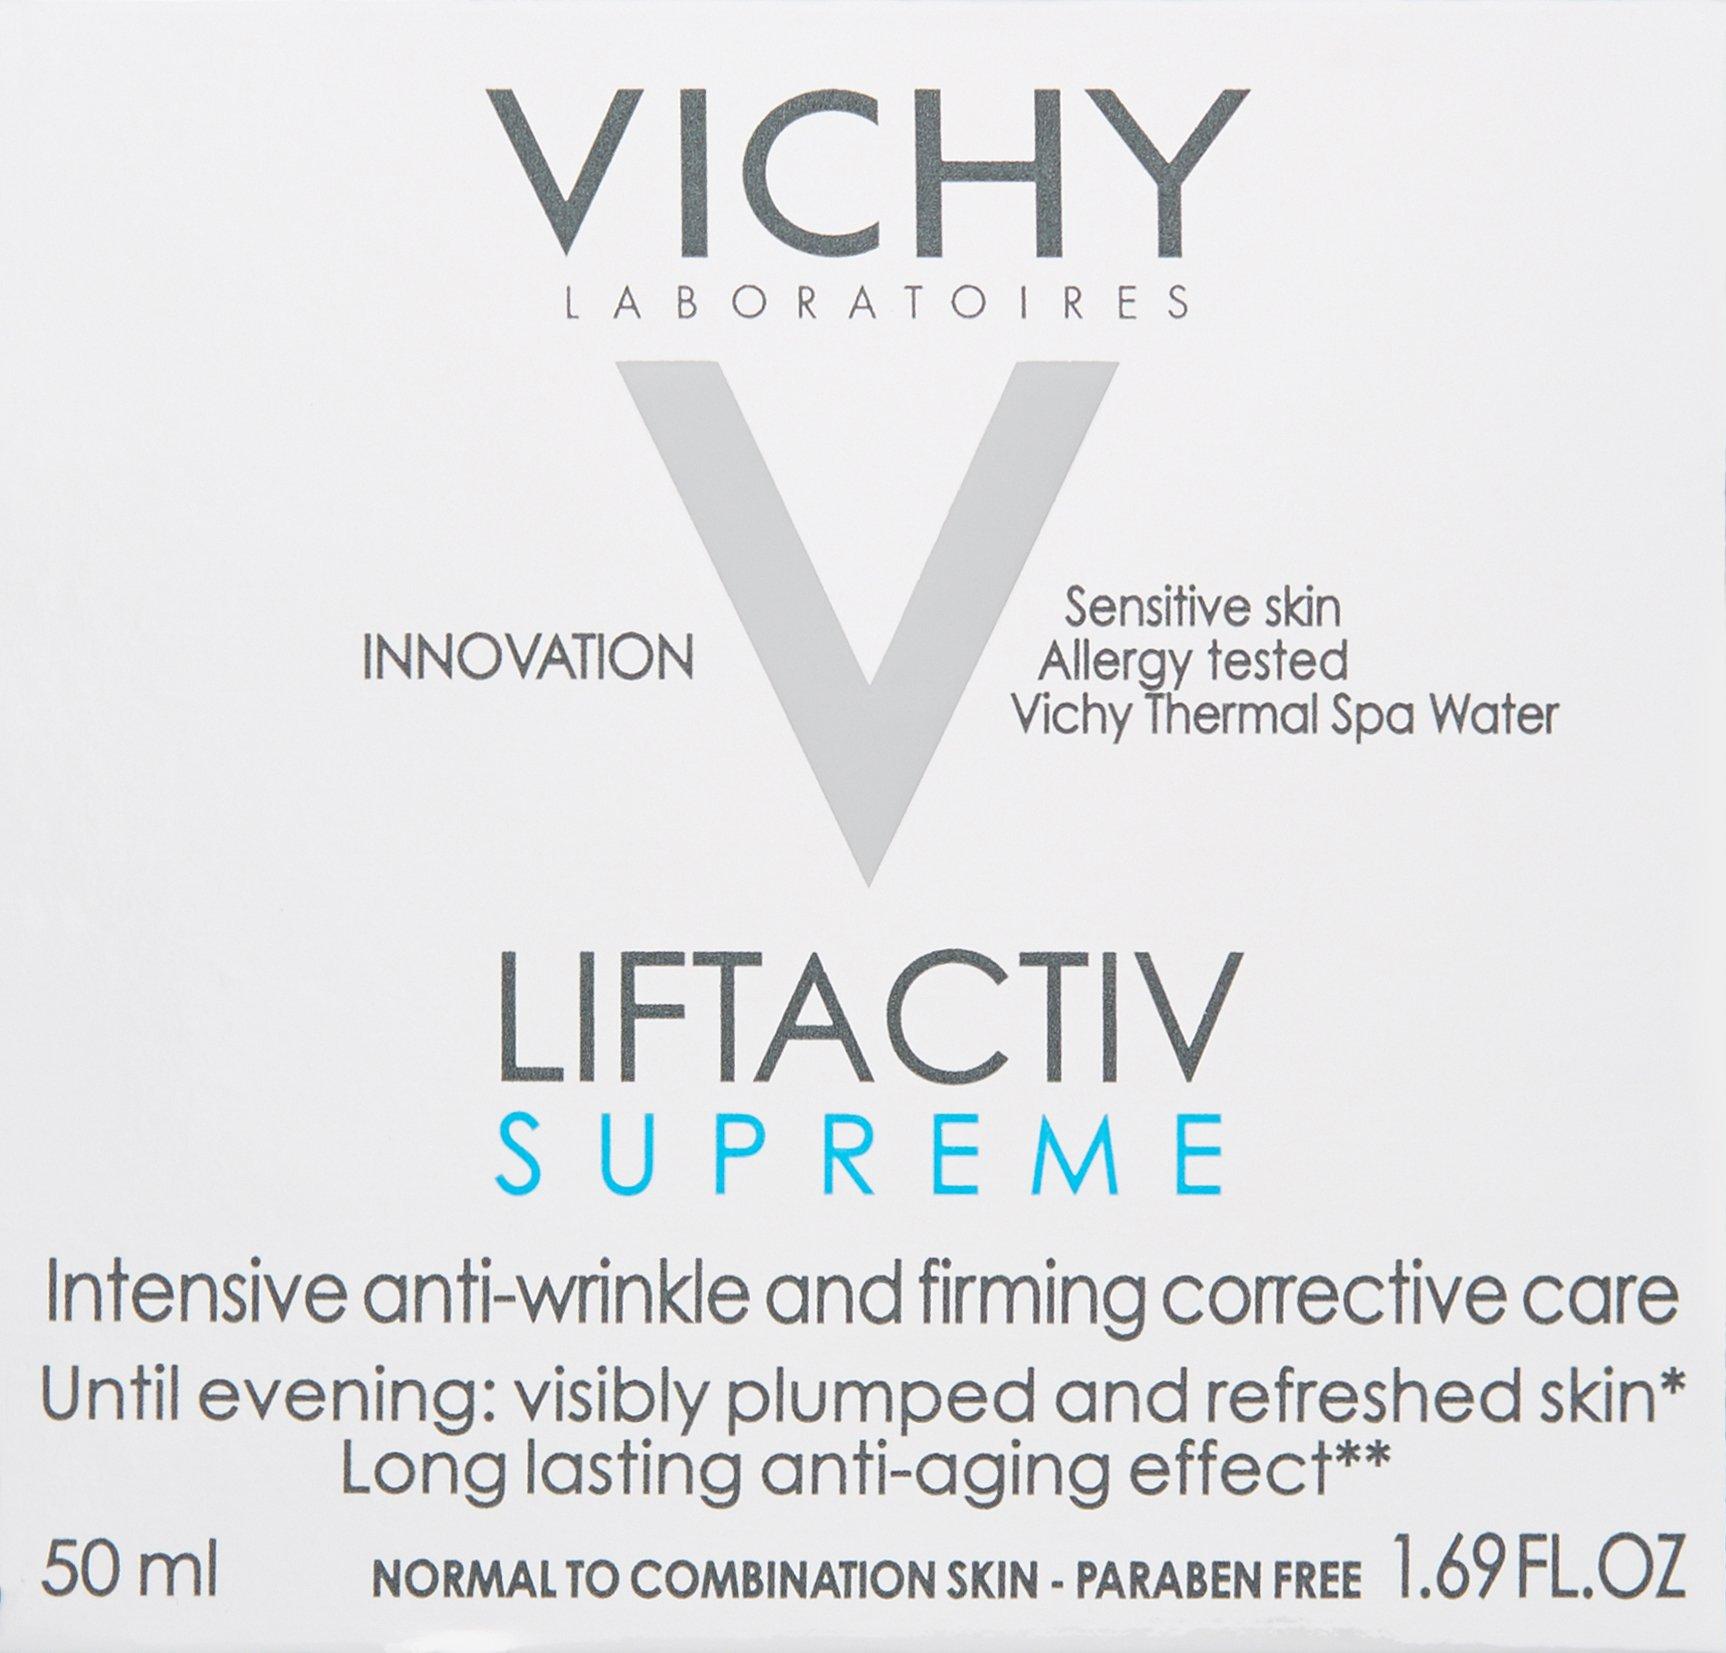 Vichy LiftActiv Supreme Anti-Wrinkle Moisturizer, 1.69 Fl. Oz. by Vichy (Image #2)